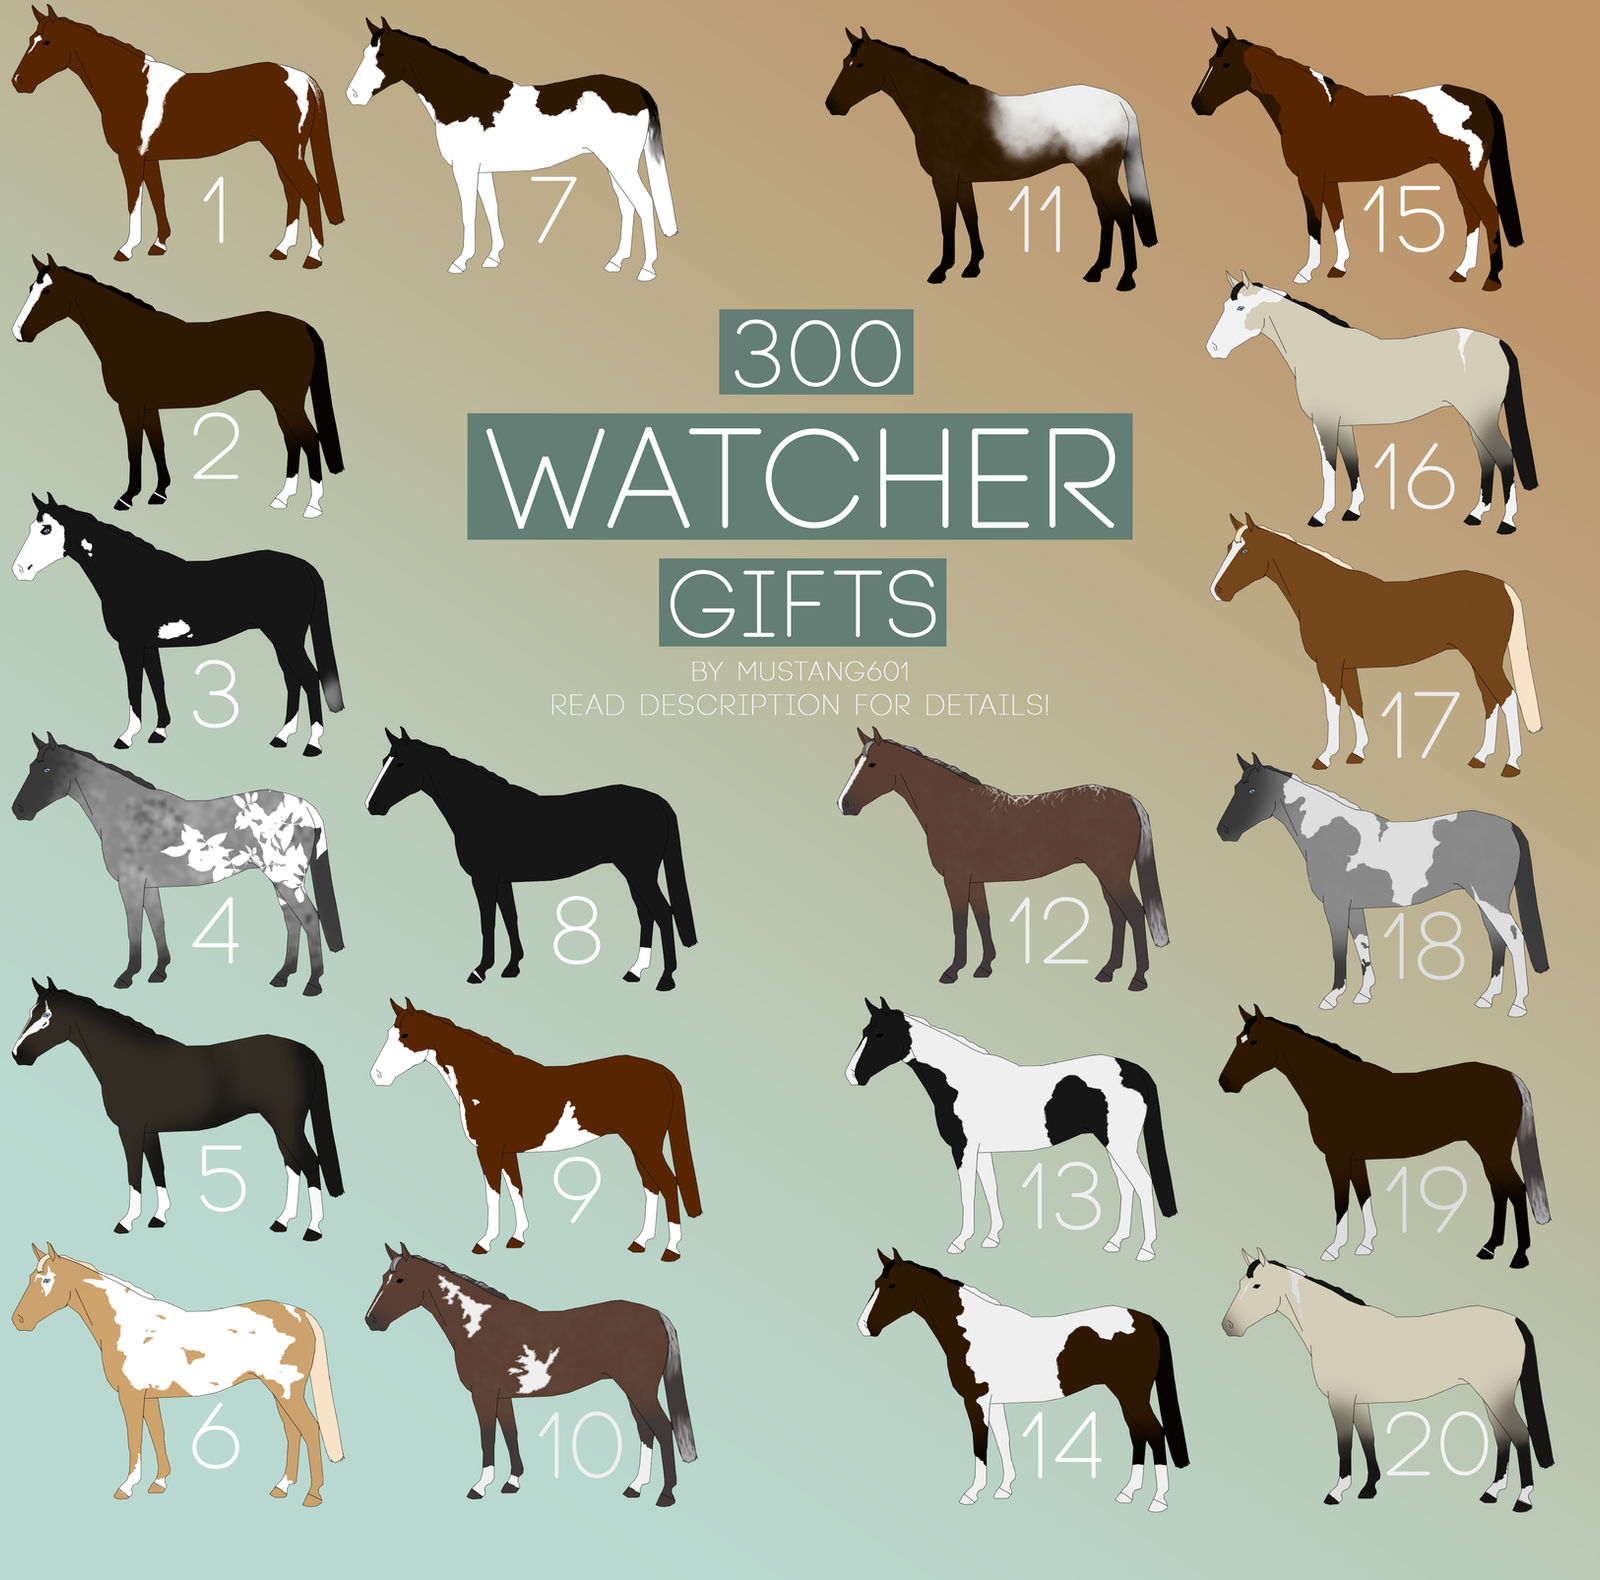 Watcher Design gifts [STILL OPEN] by Mustang601